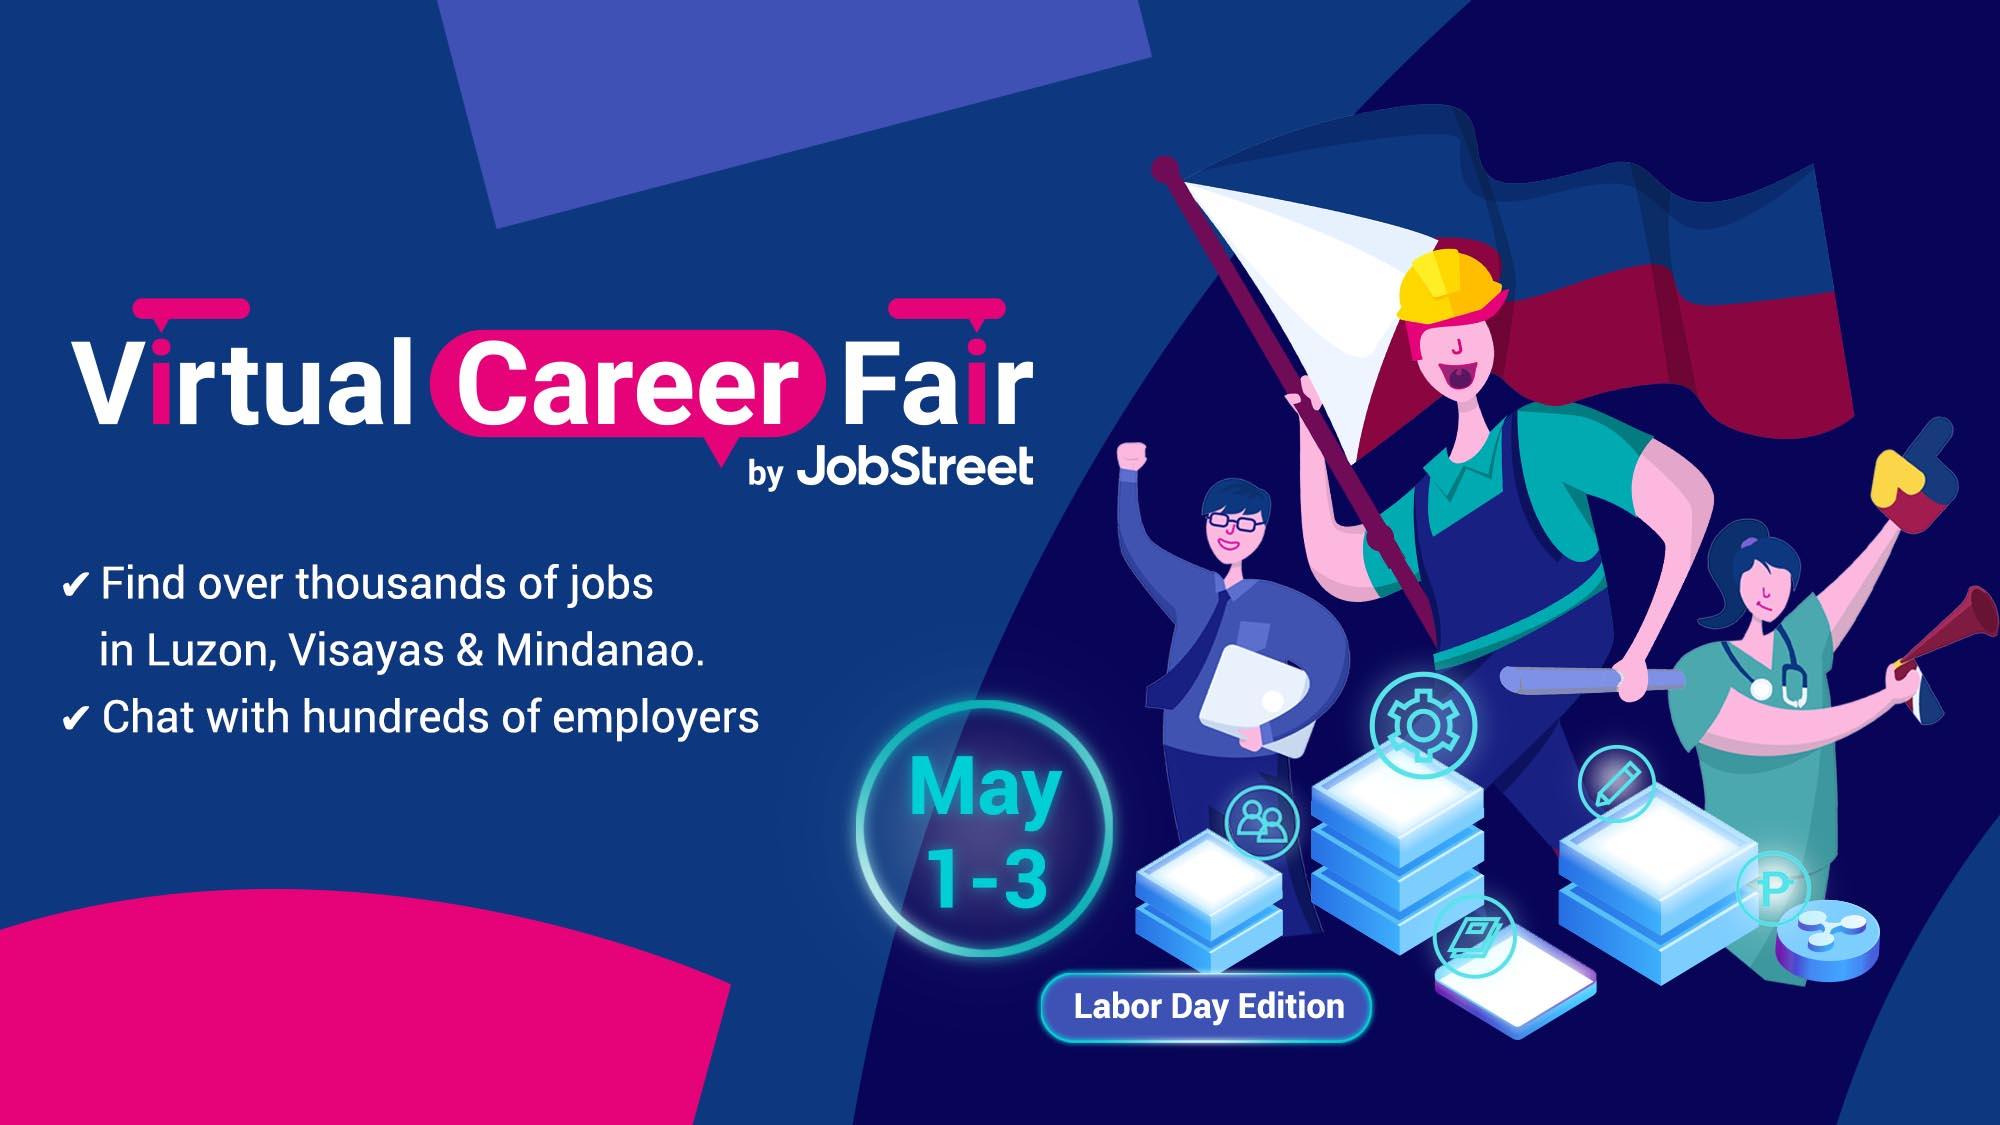 Jobstreet PH Virtual Career Fair